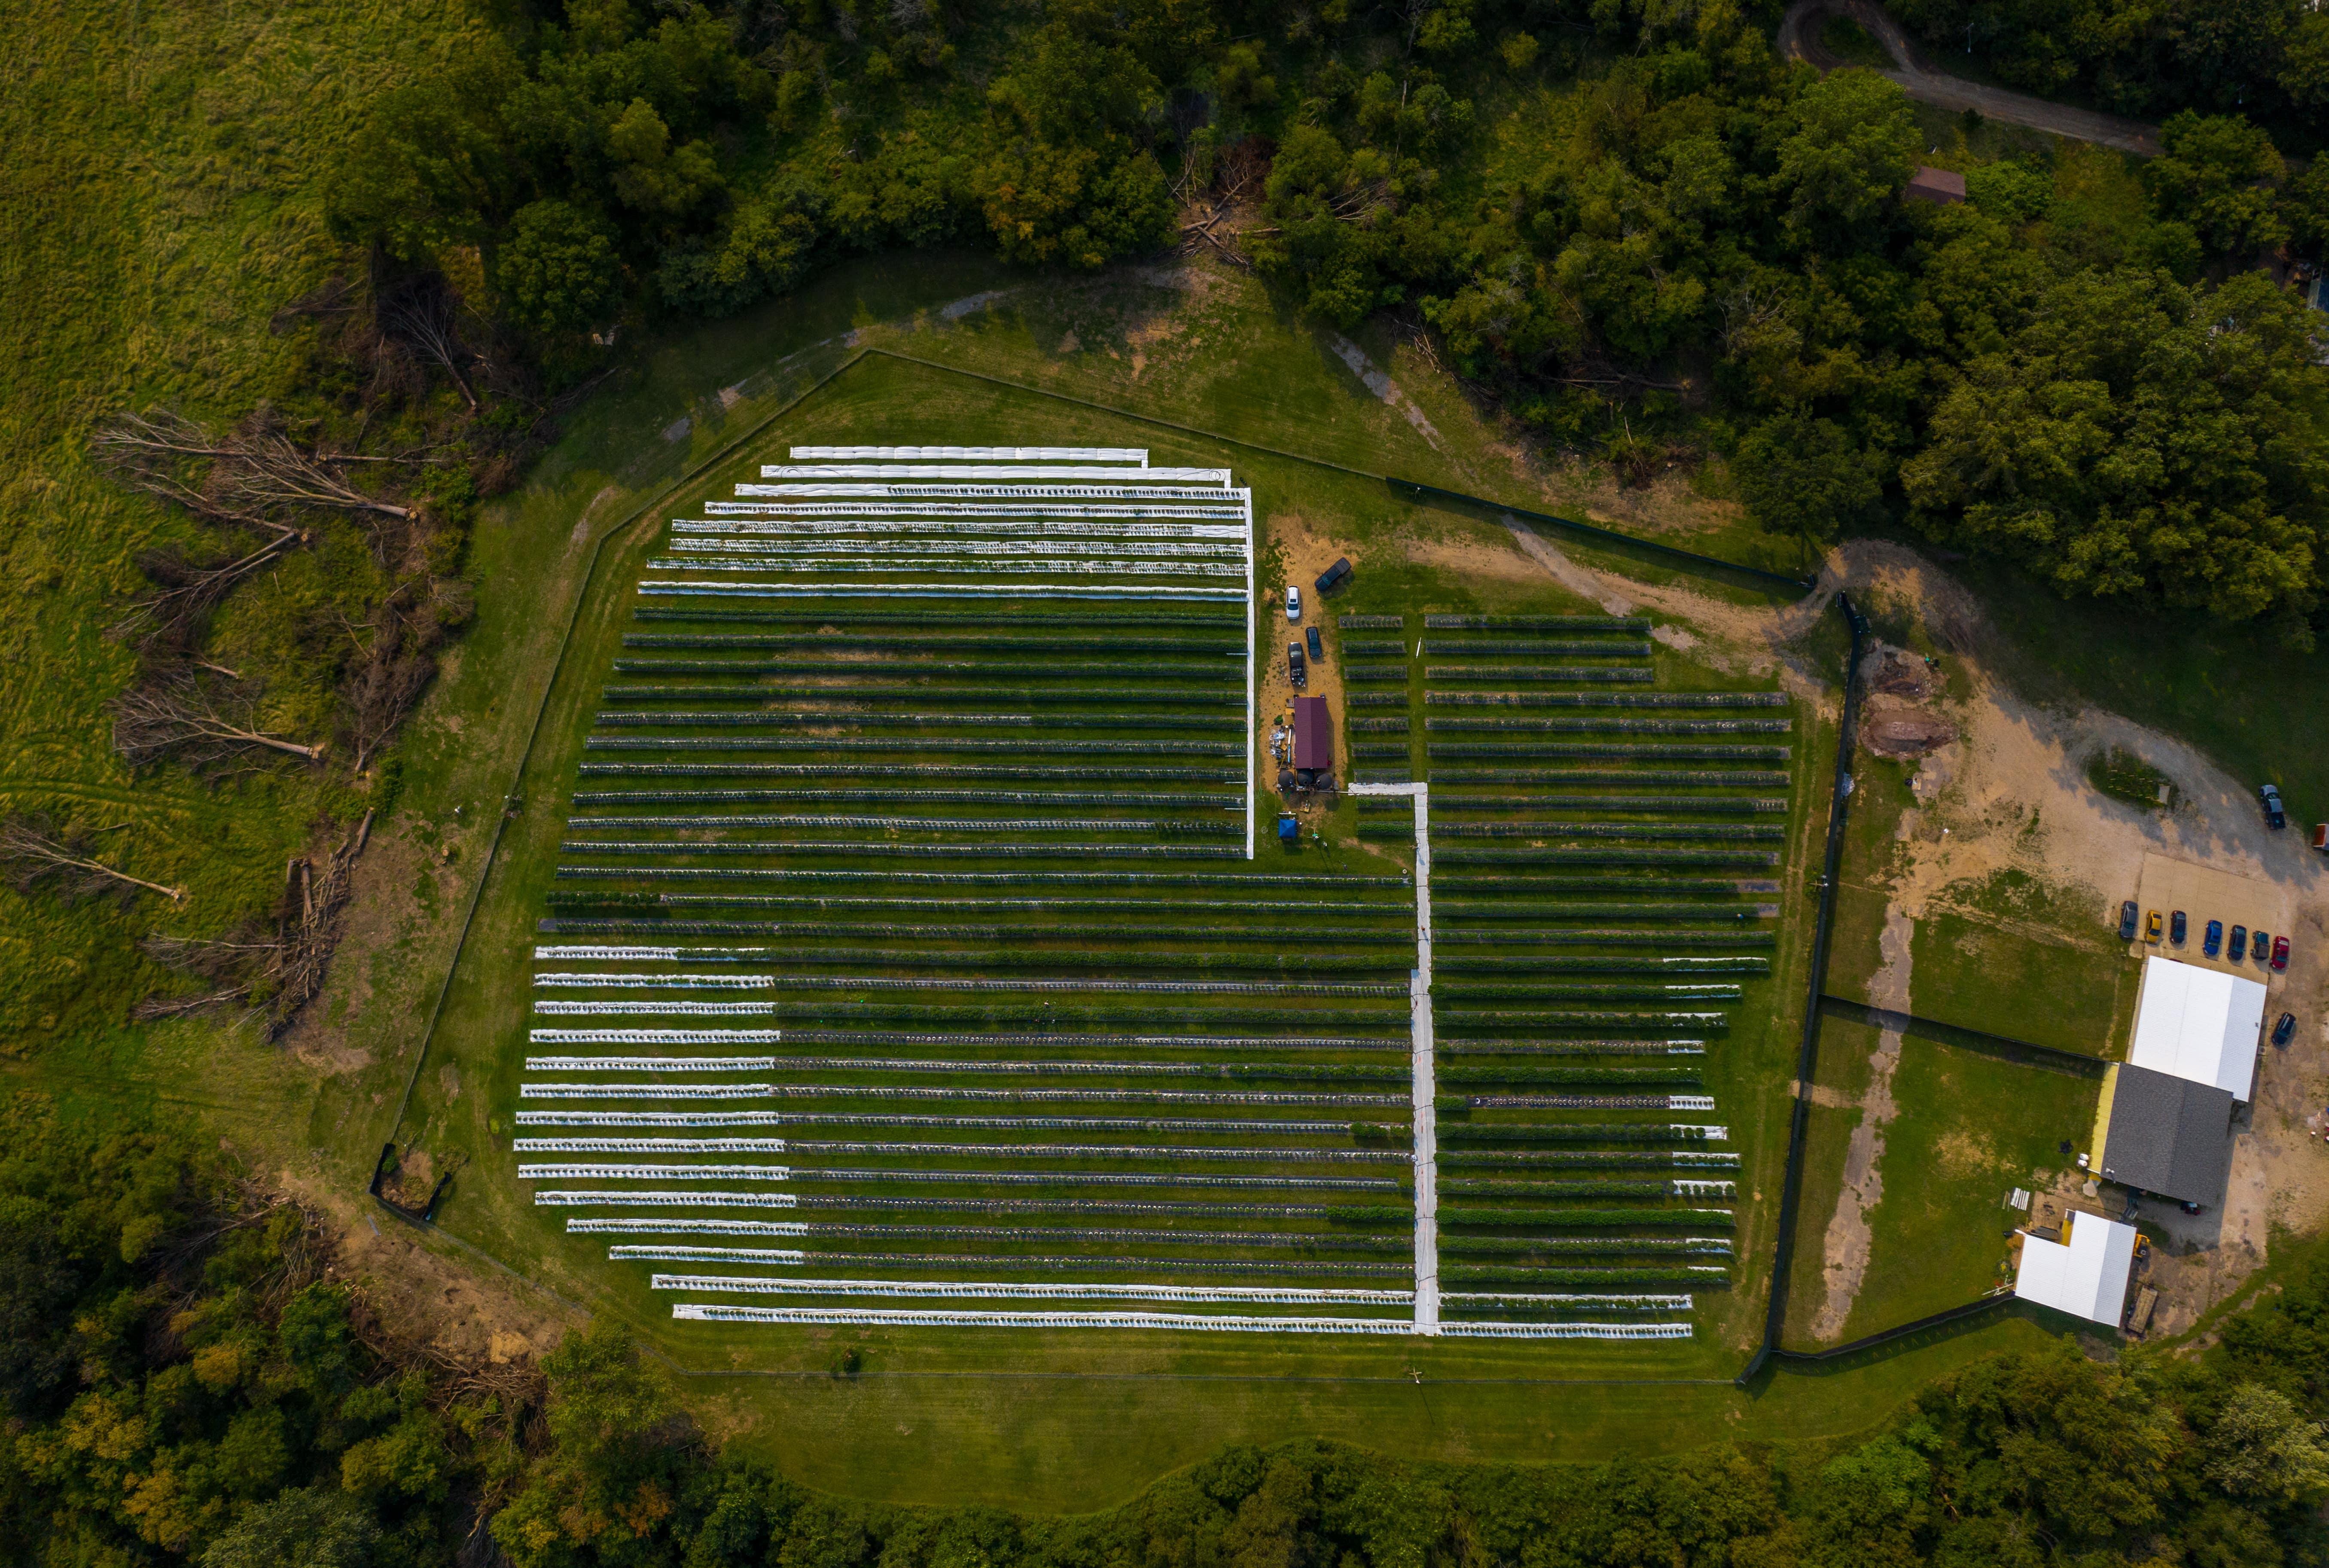 Top down shot of facilities